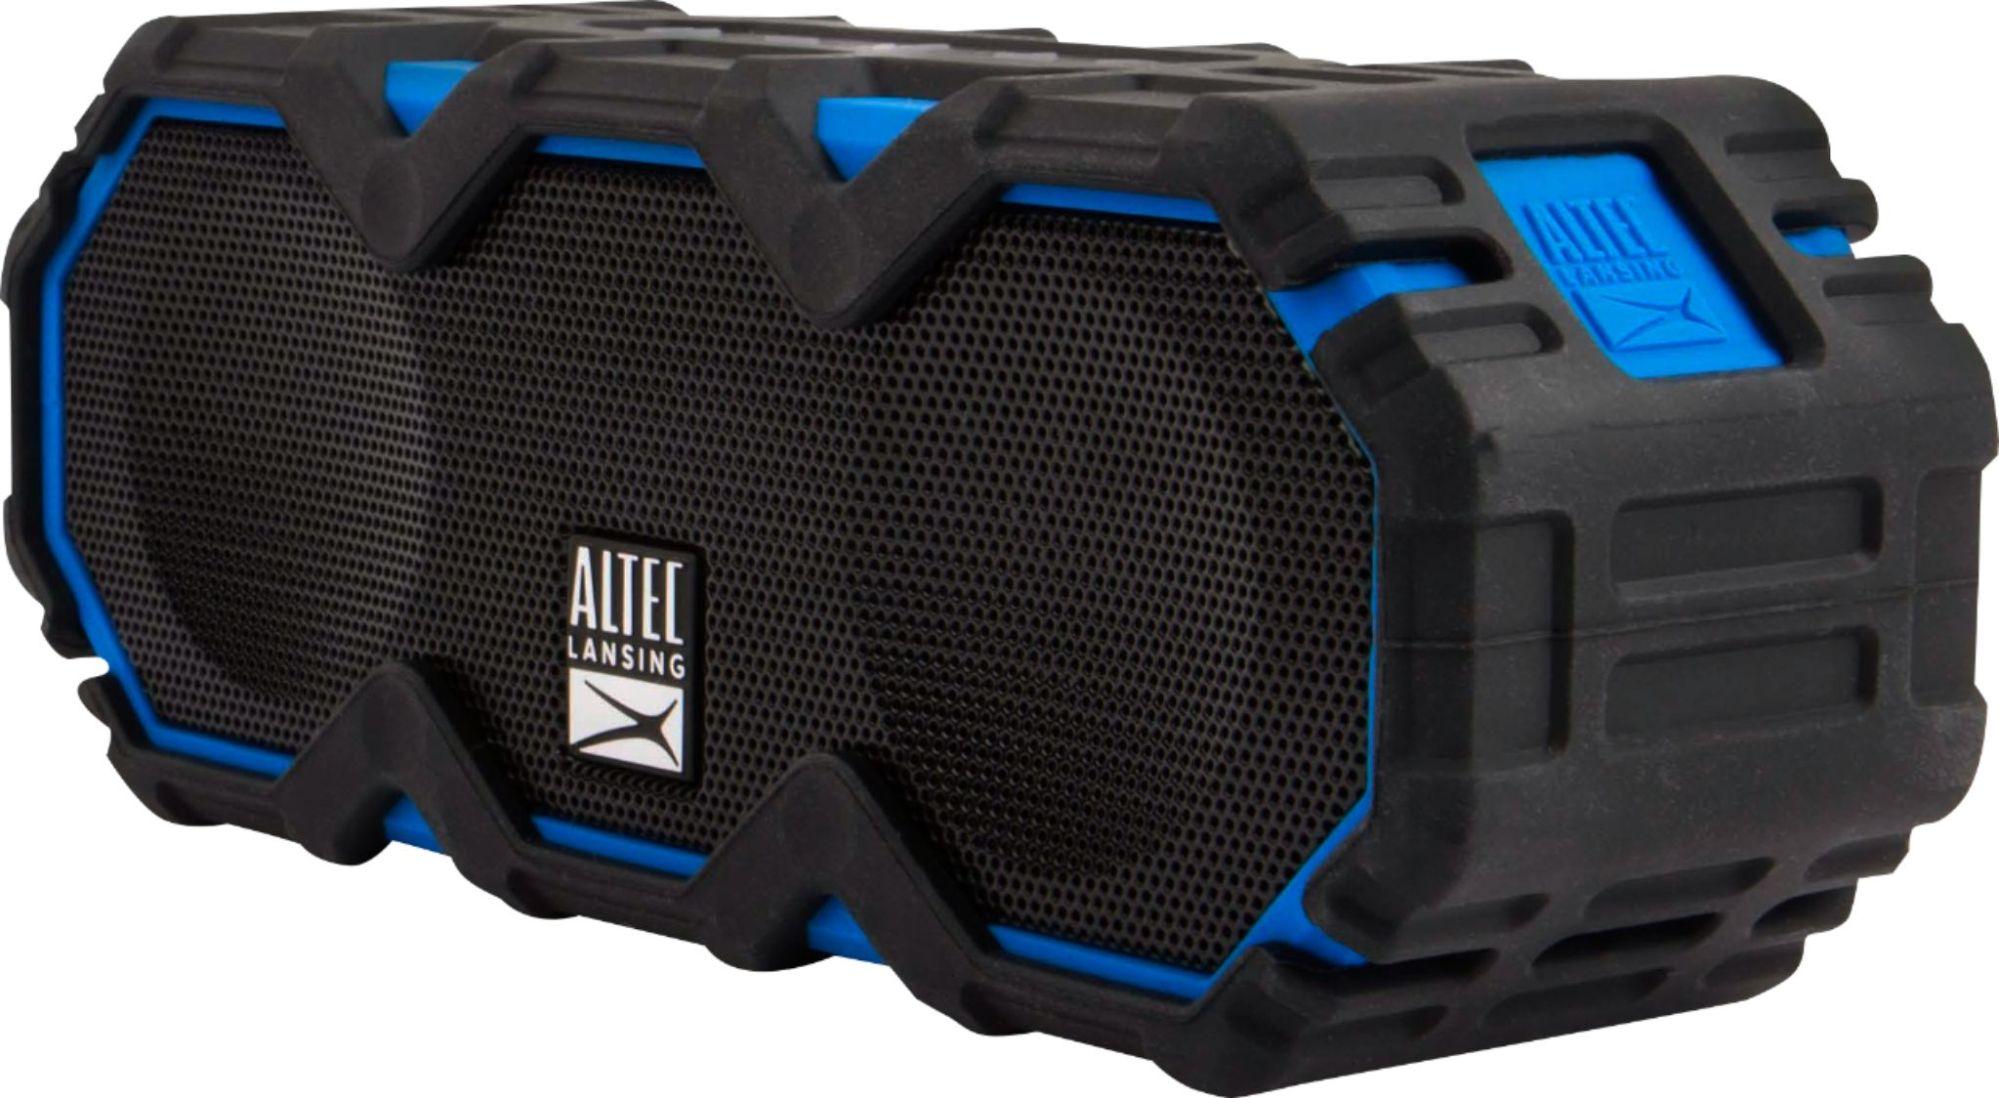 hight resolution of altec lansing jolt mini lifejacket portable bluetooth speaker blue imw479 ryb best buy